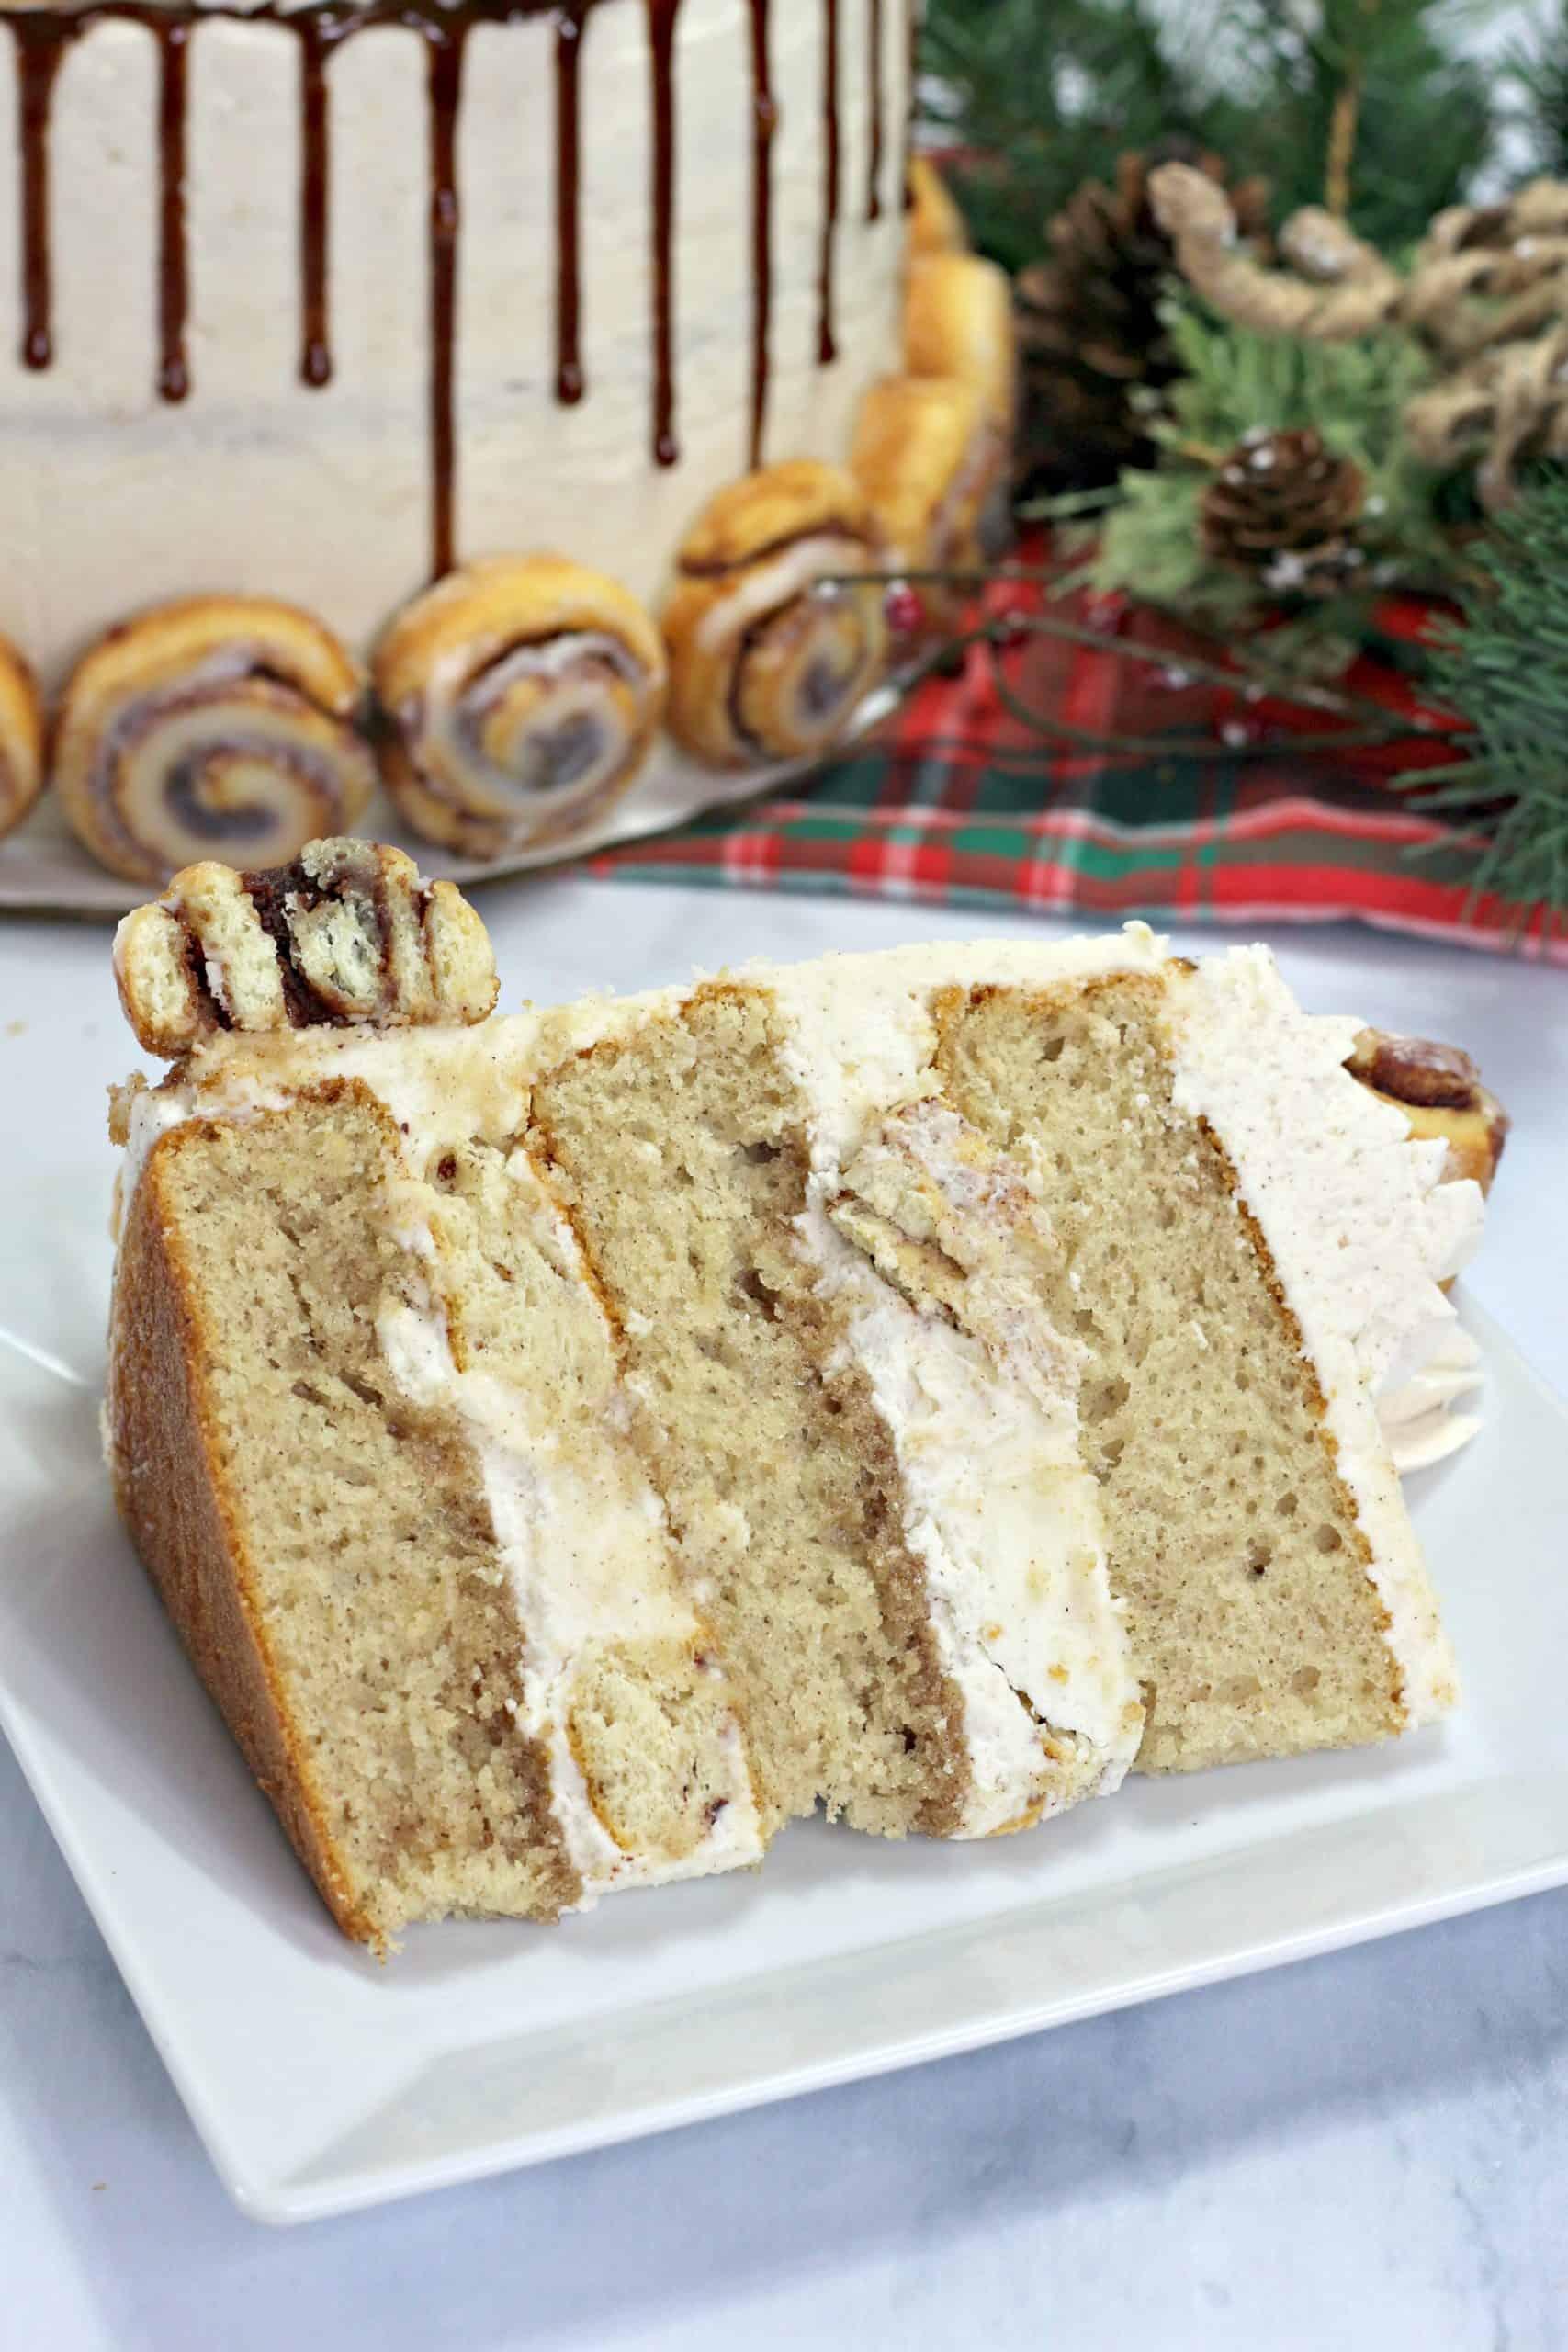 cinnamon roll layer cake on plate